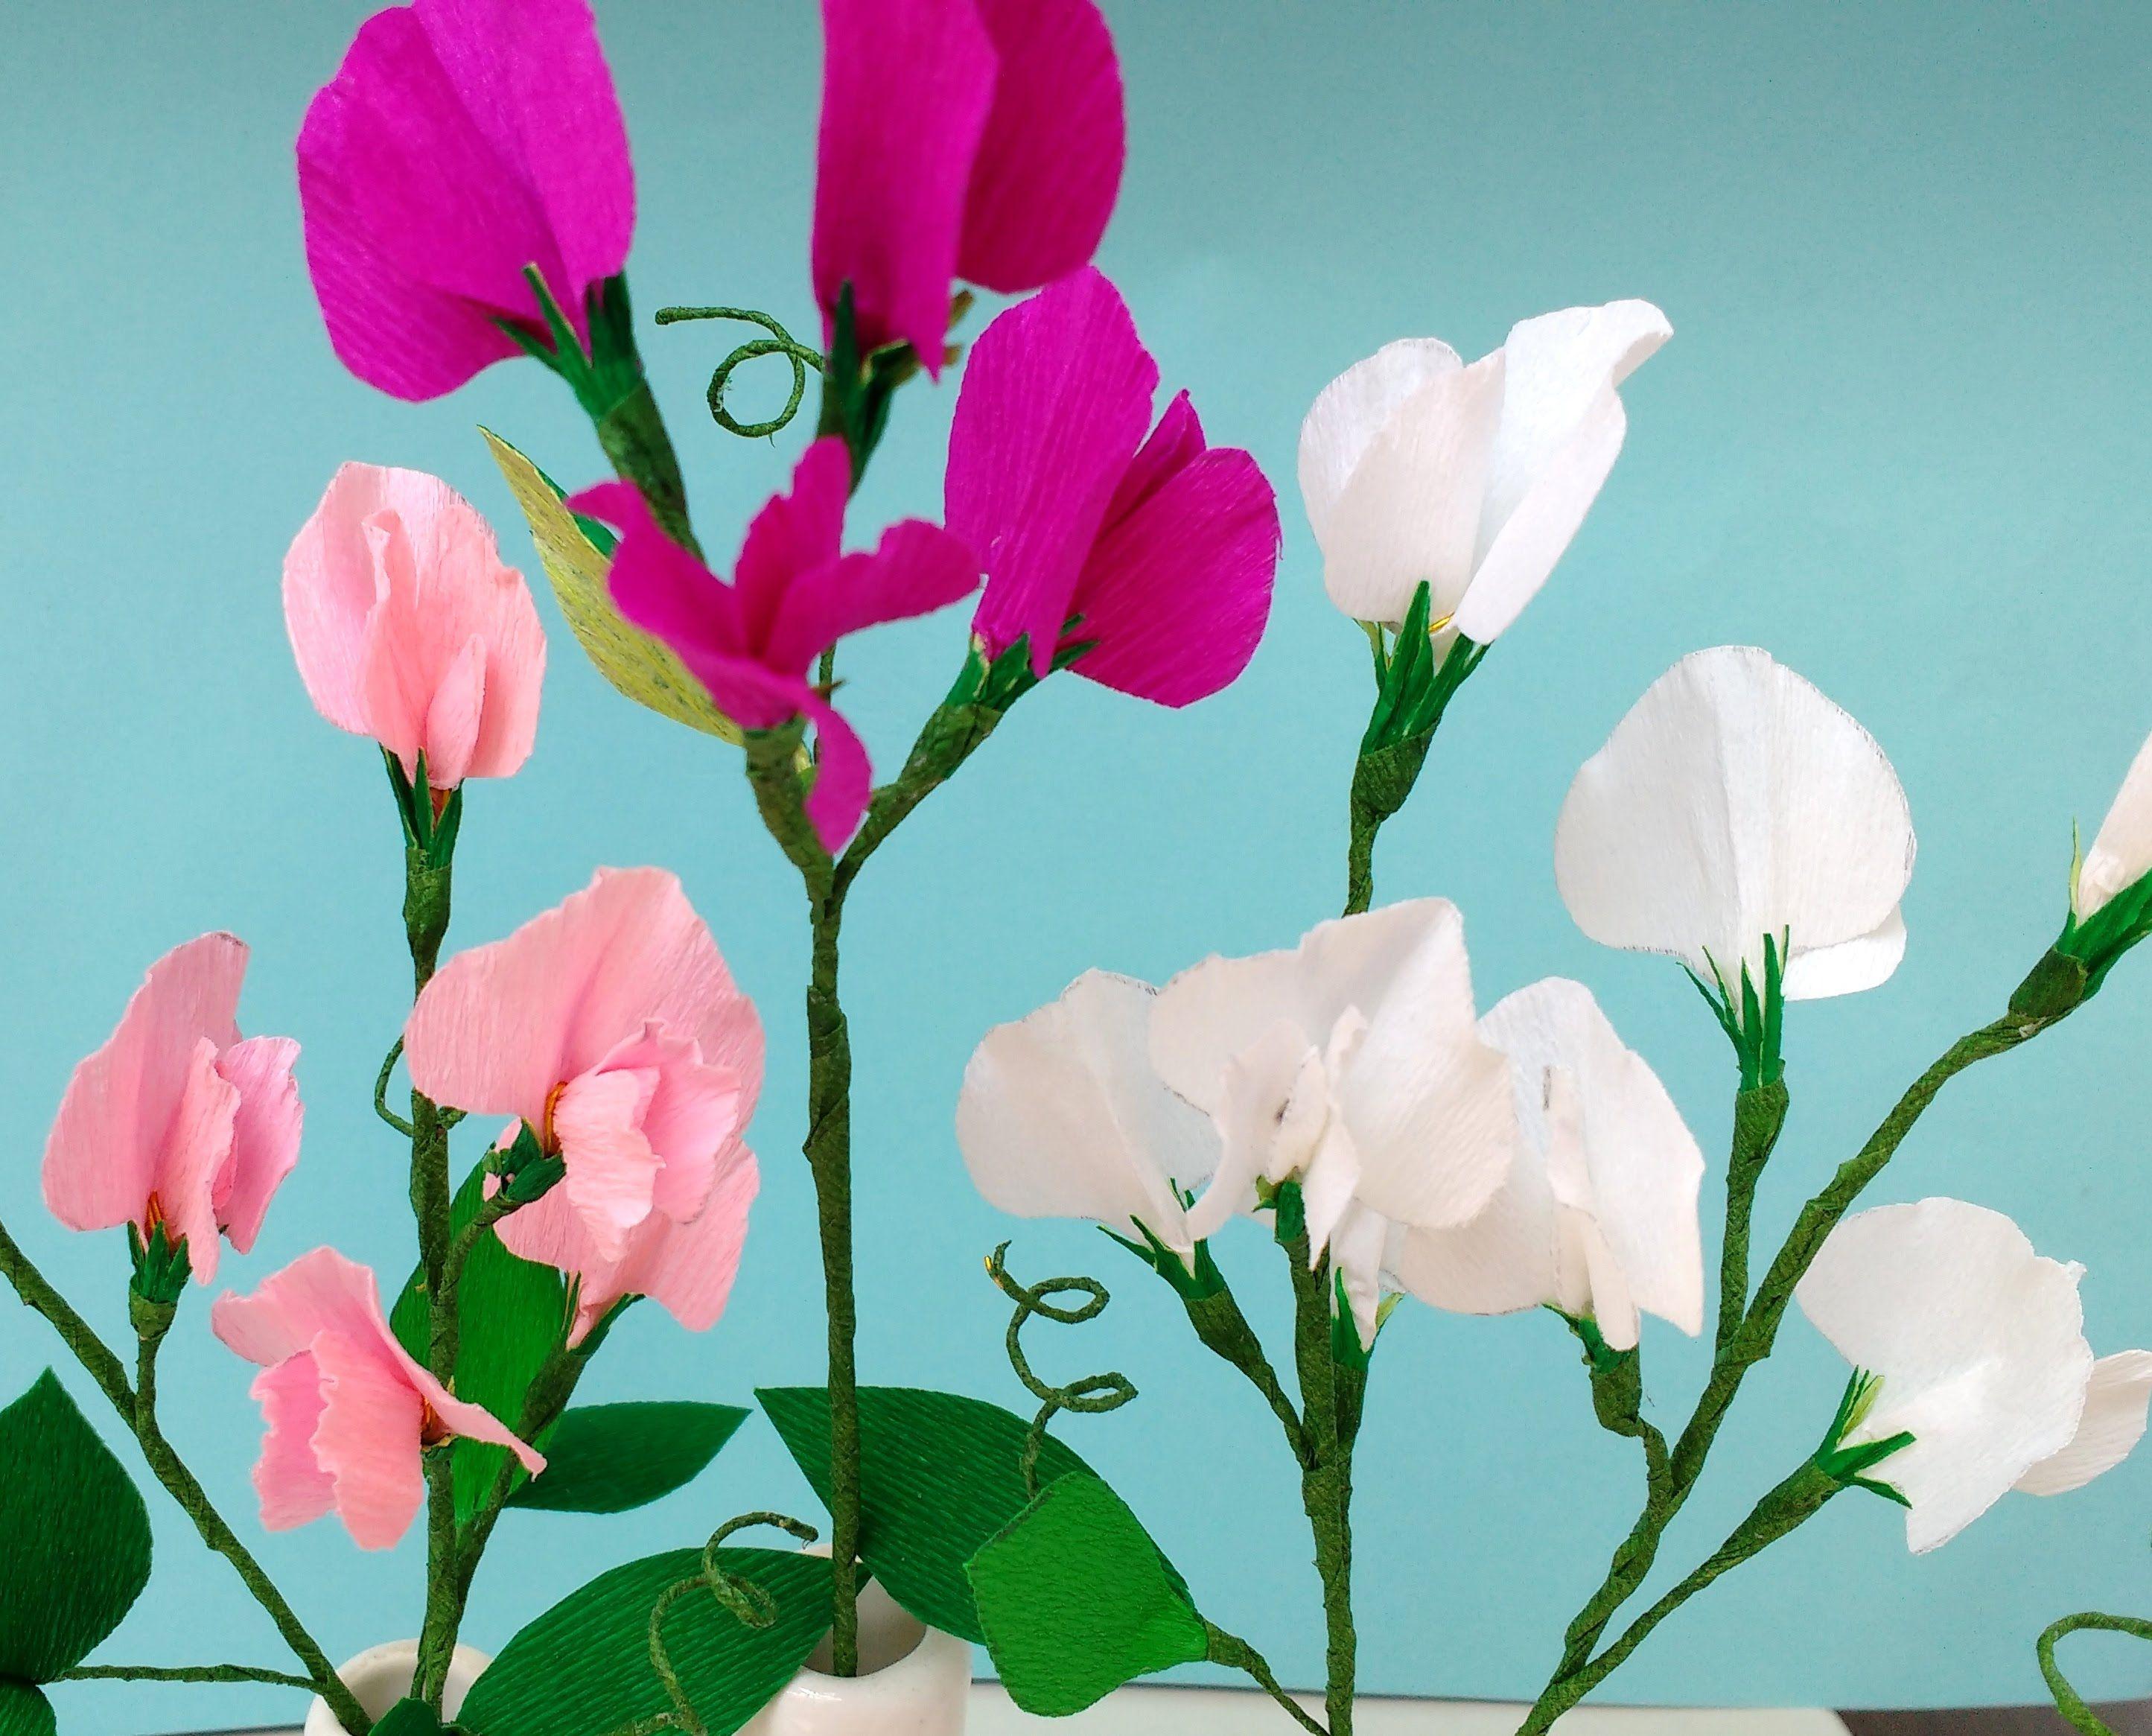 Paper Flowers Sweet Pea Cositas Pinterest Flowers Flower And